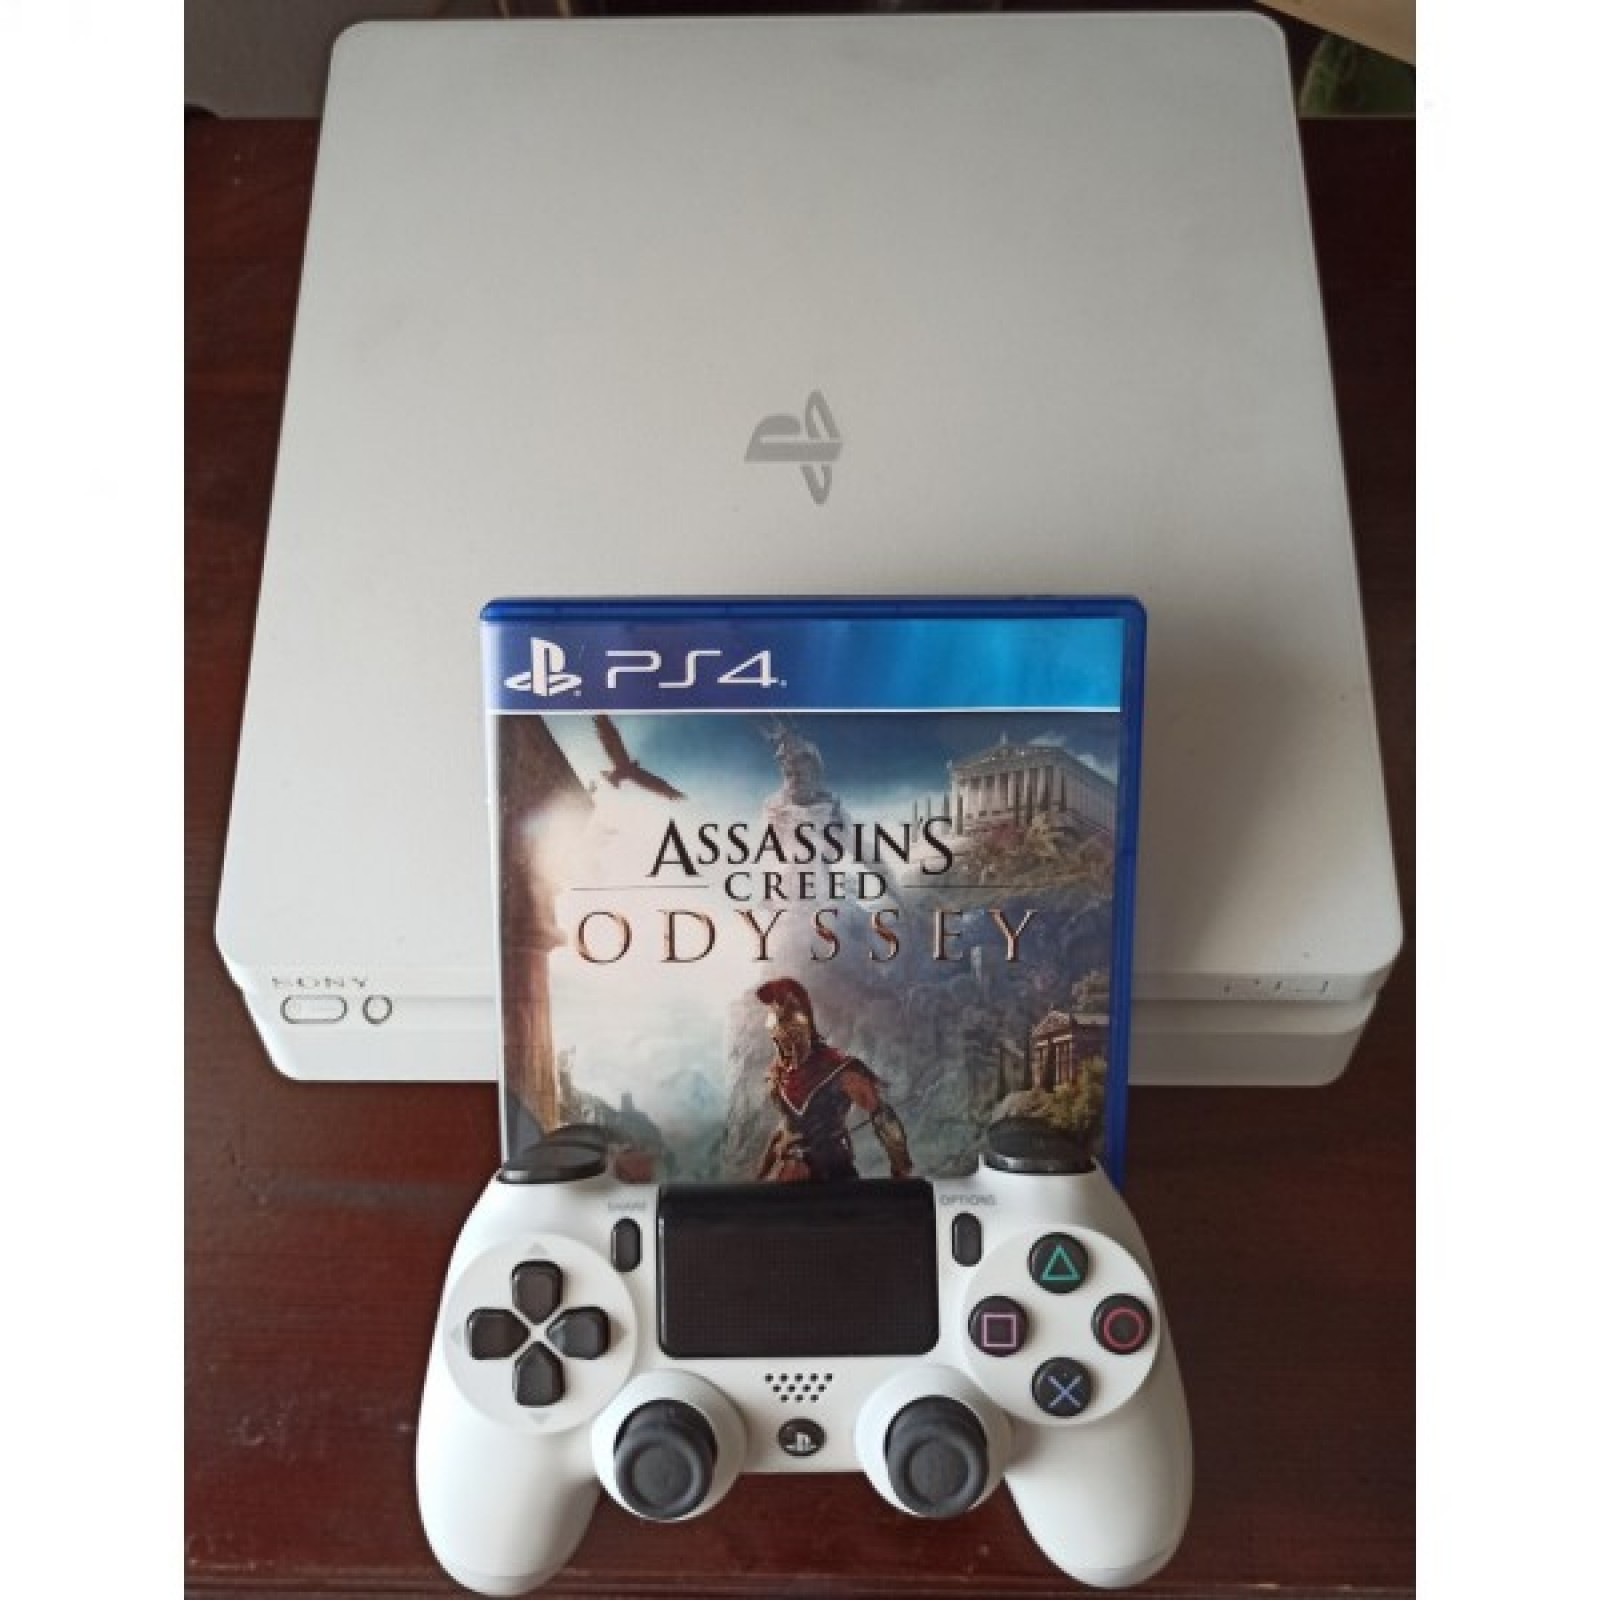 PlayStation 4 Slim Glacier White 500GB+Assassin's Creed Odyssey